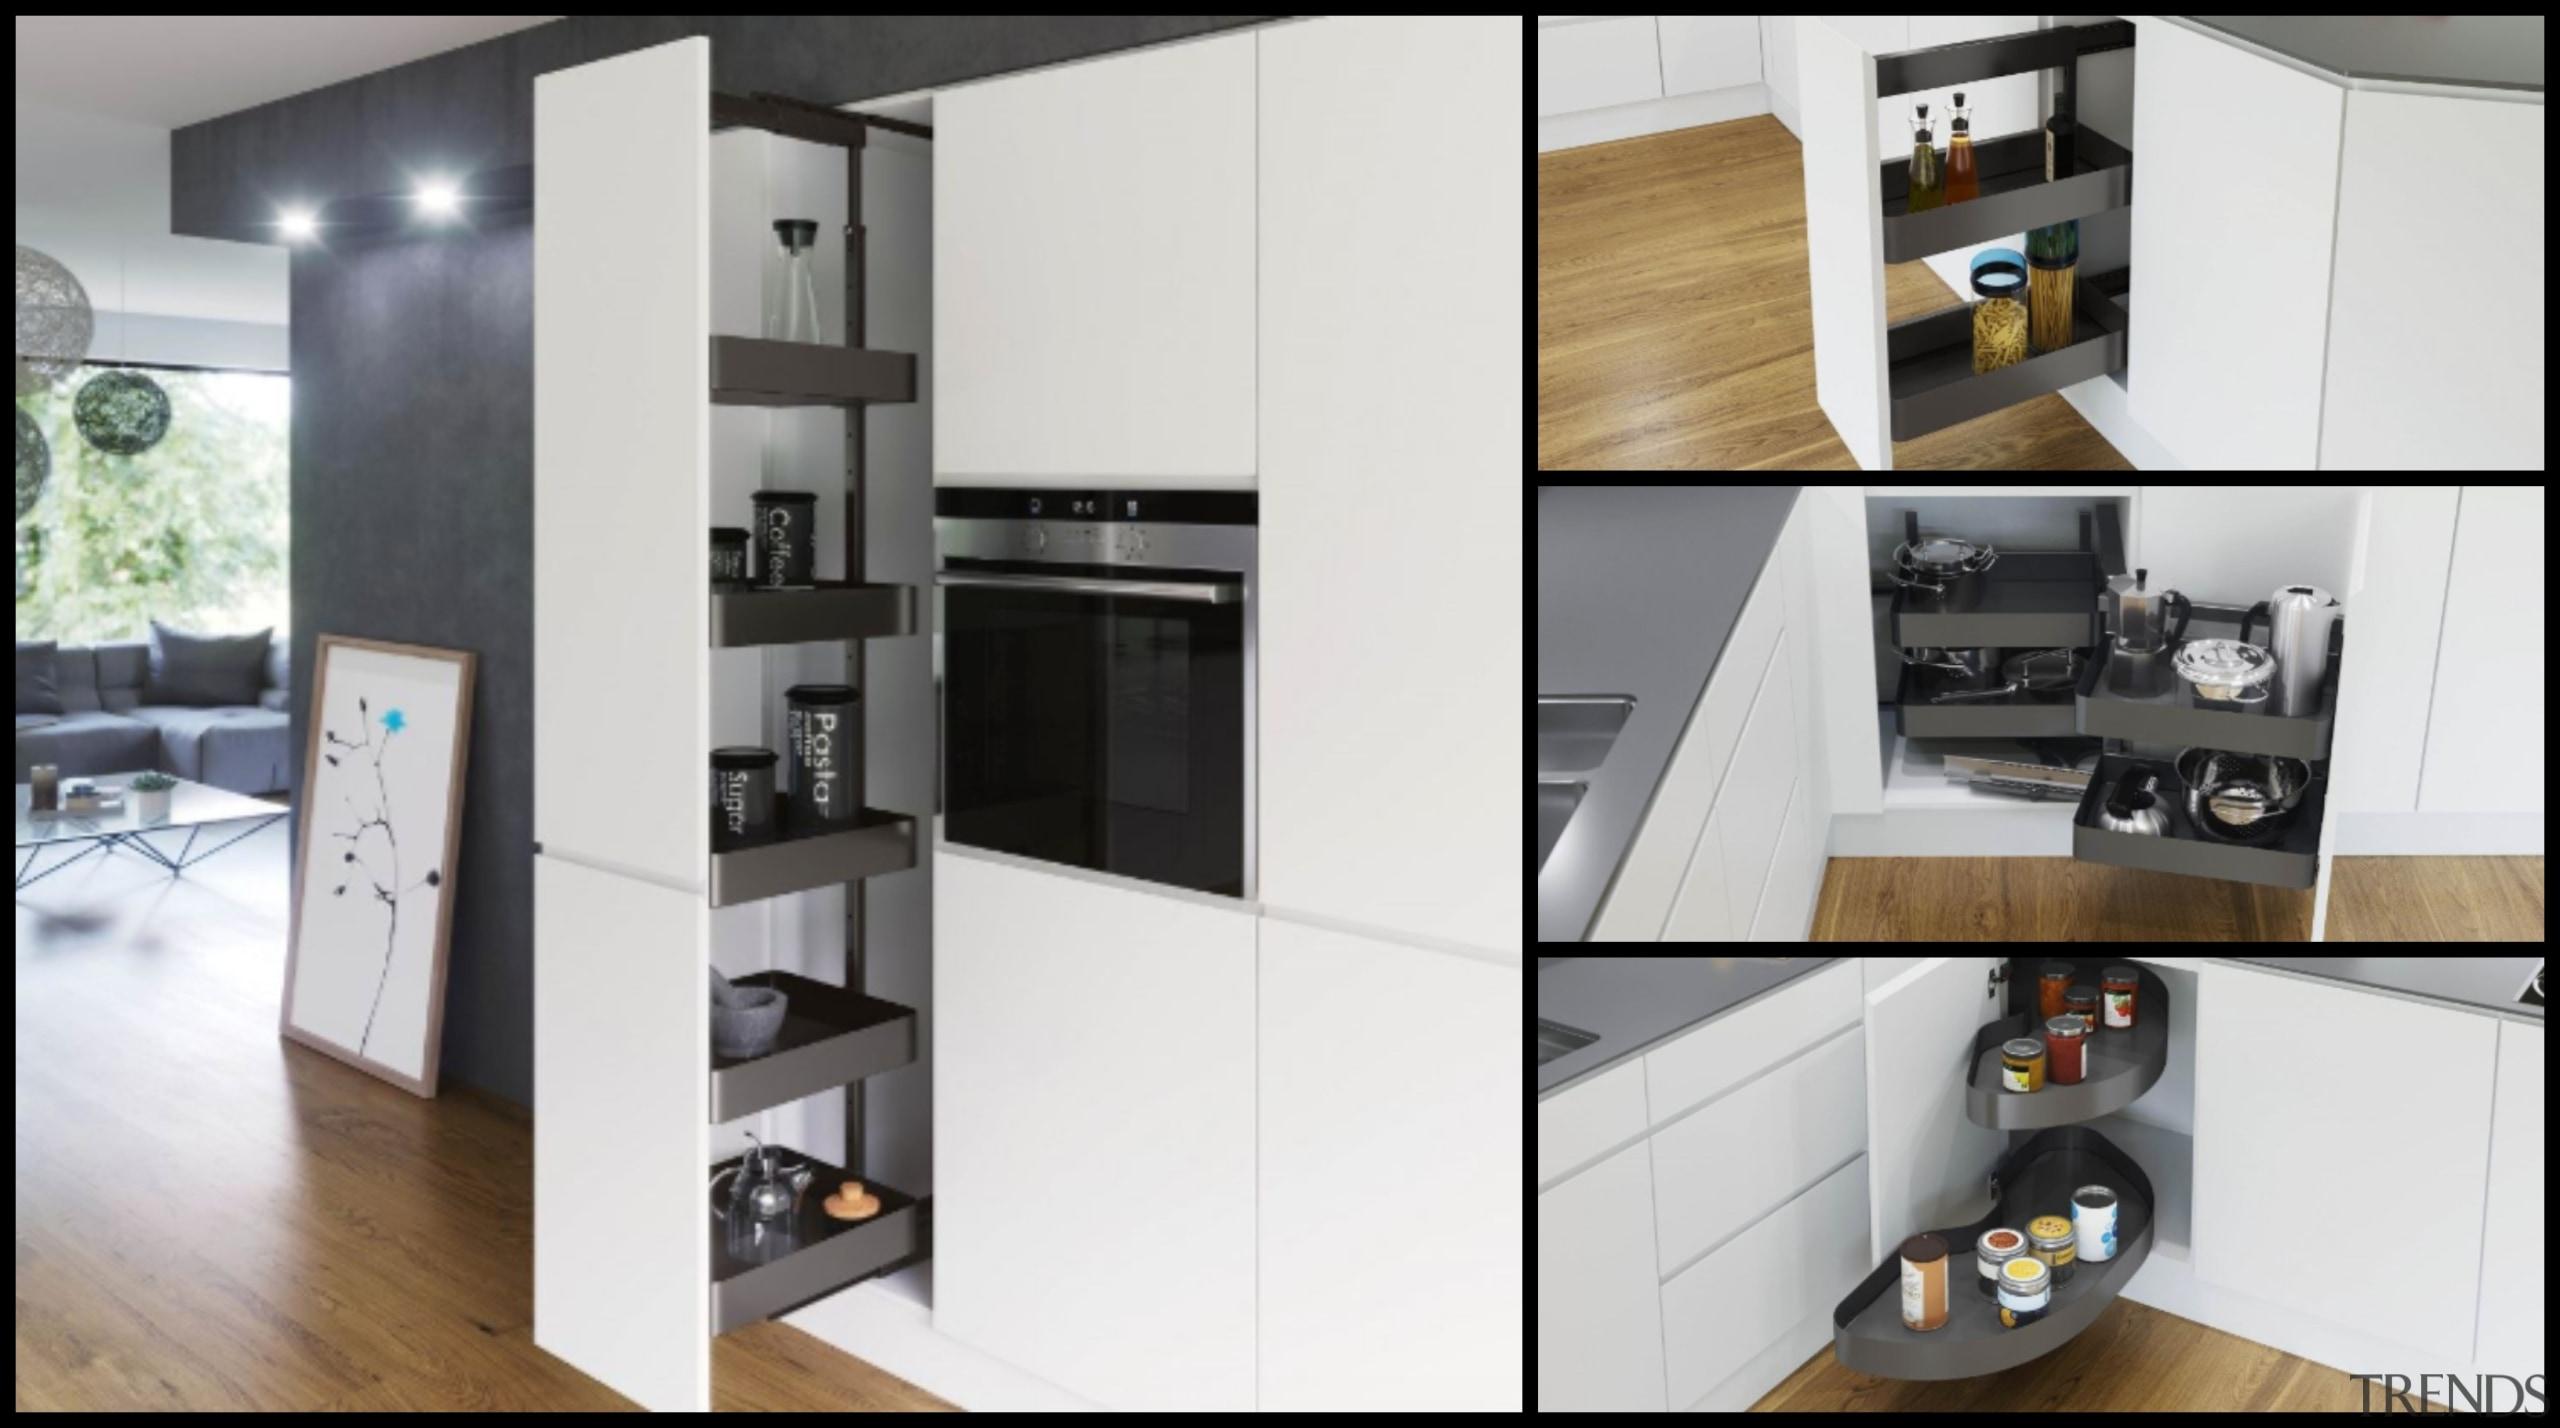 Want to improve your kitchen storage? - furniture furniture, interior design, kitchen, product, white